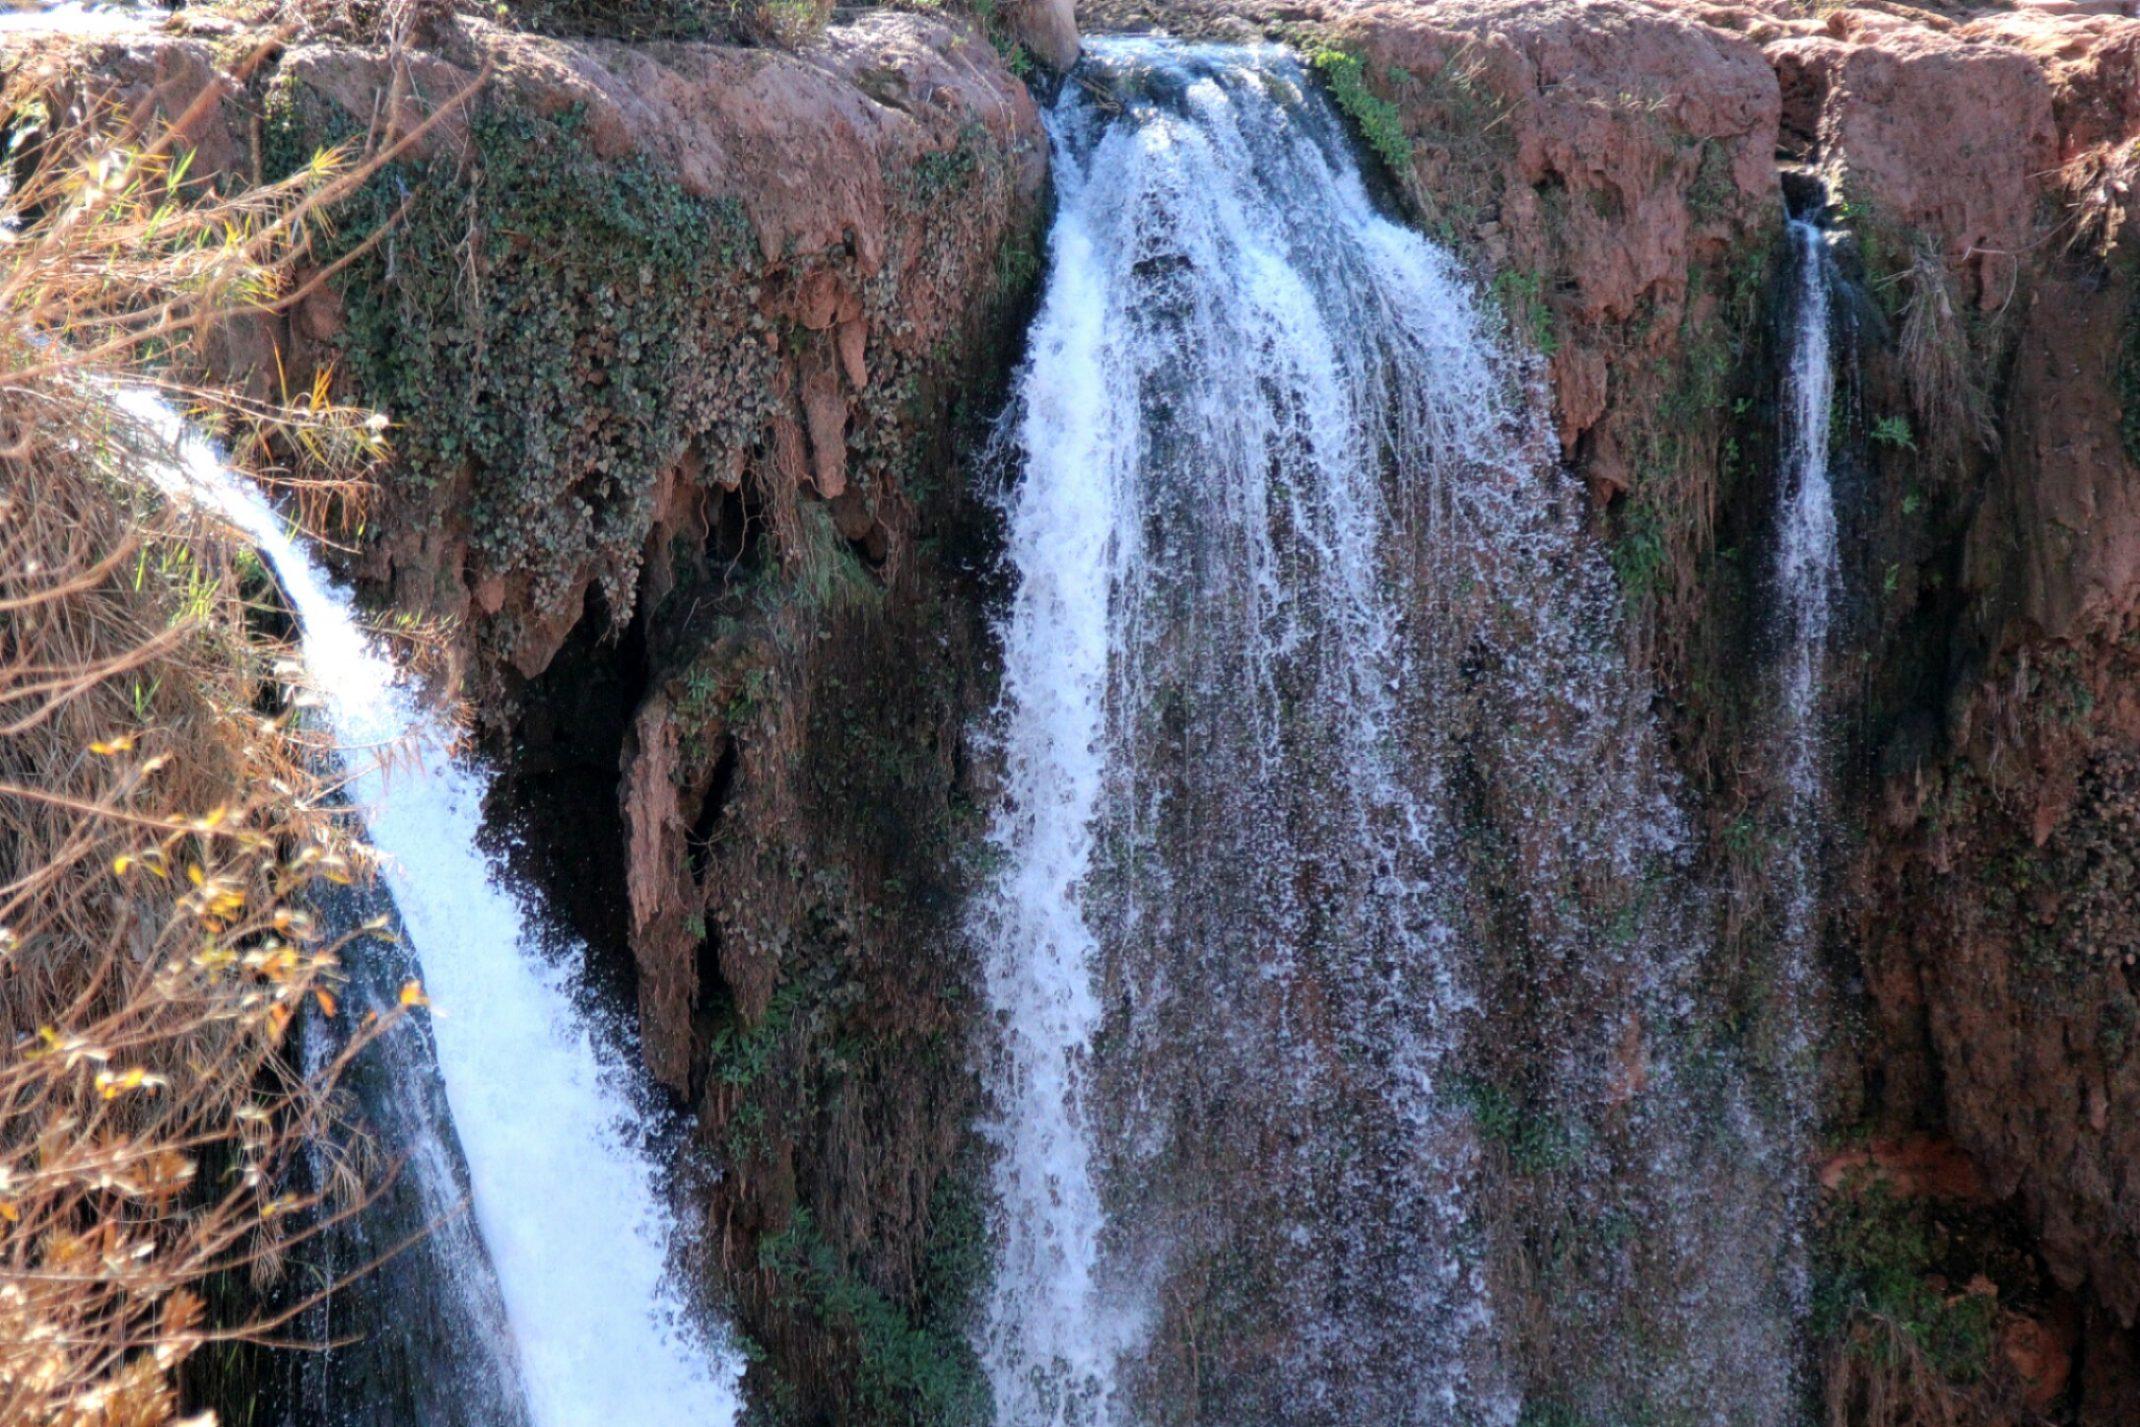 Maroko,Wodospady Szallalat Uzud